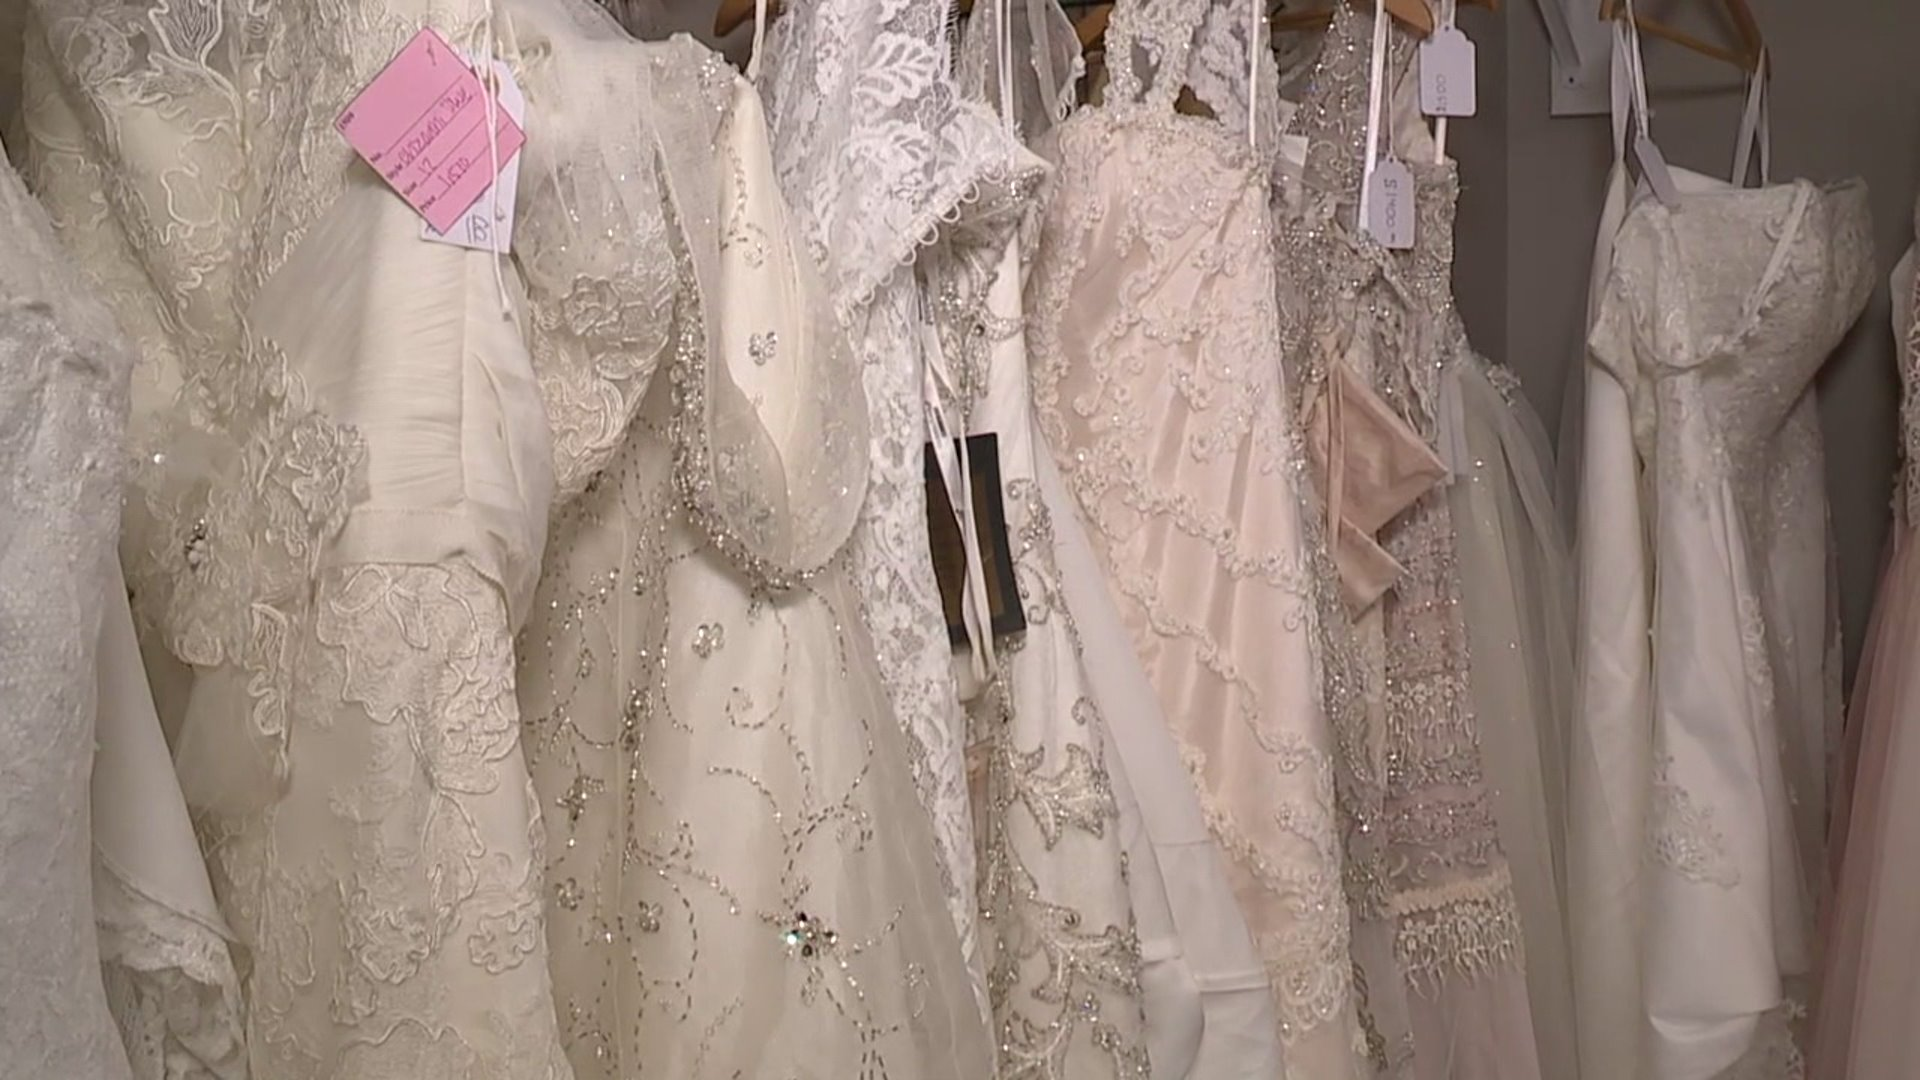 Small Business Spotlight: Noa's Bridal